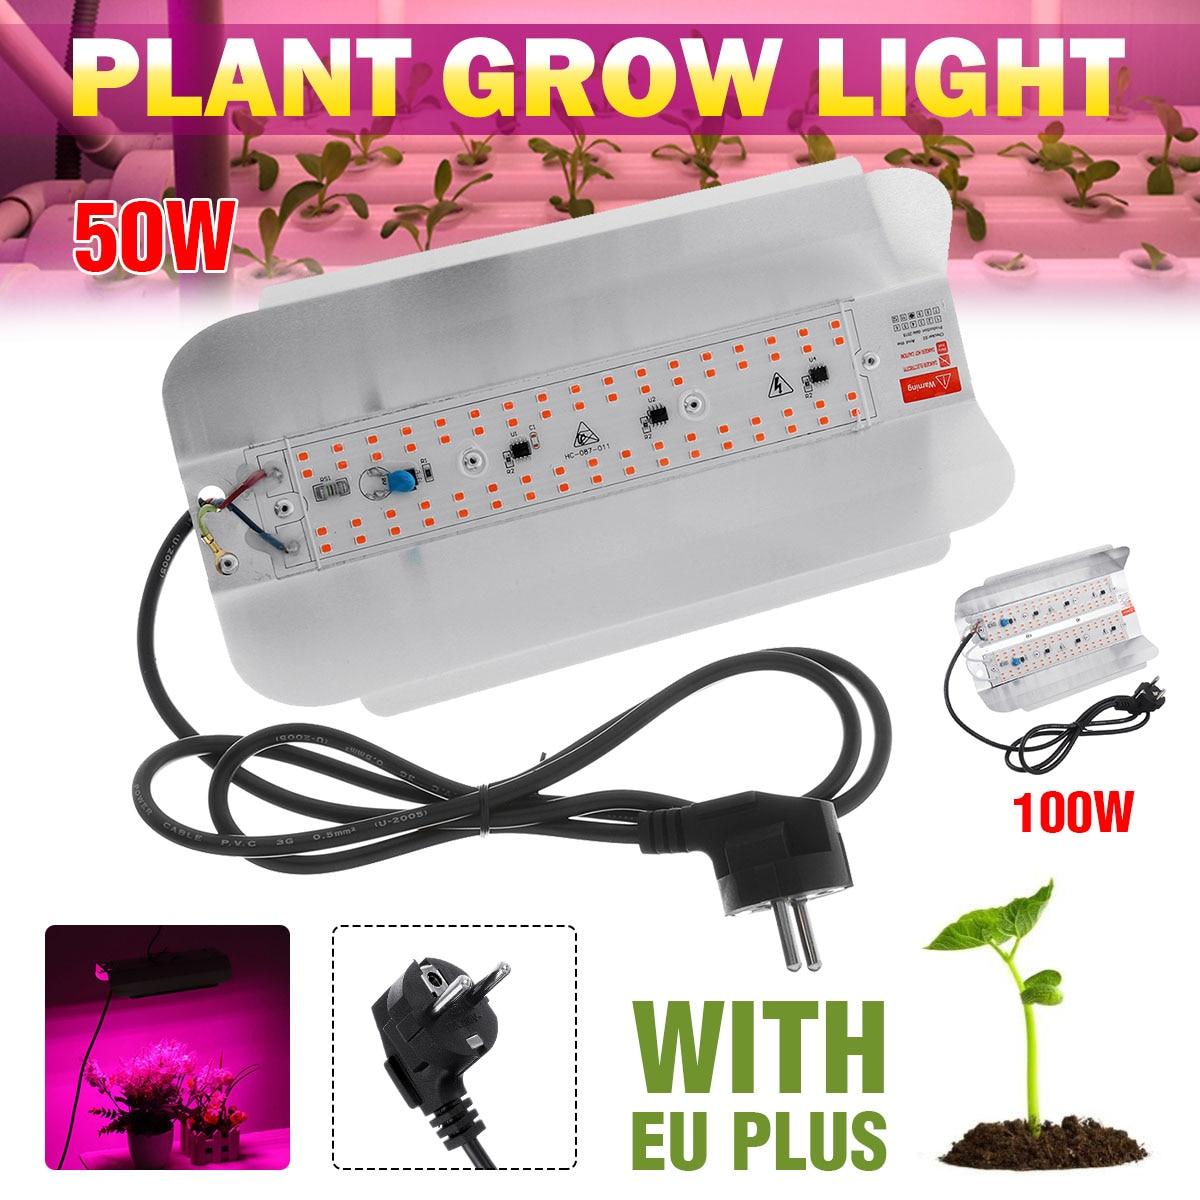 50W 100W LED Phyto Flood Lights With EU Plug  Full Spectrum High Power LED Grow Light Hydroponic Seeding 220V IP65 Waterproof